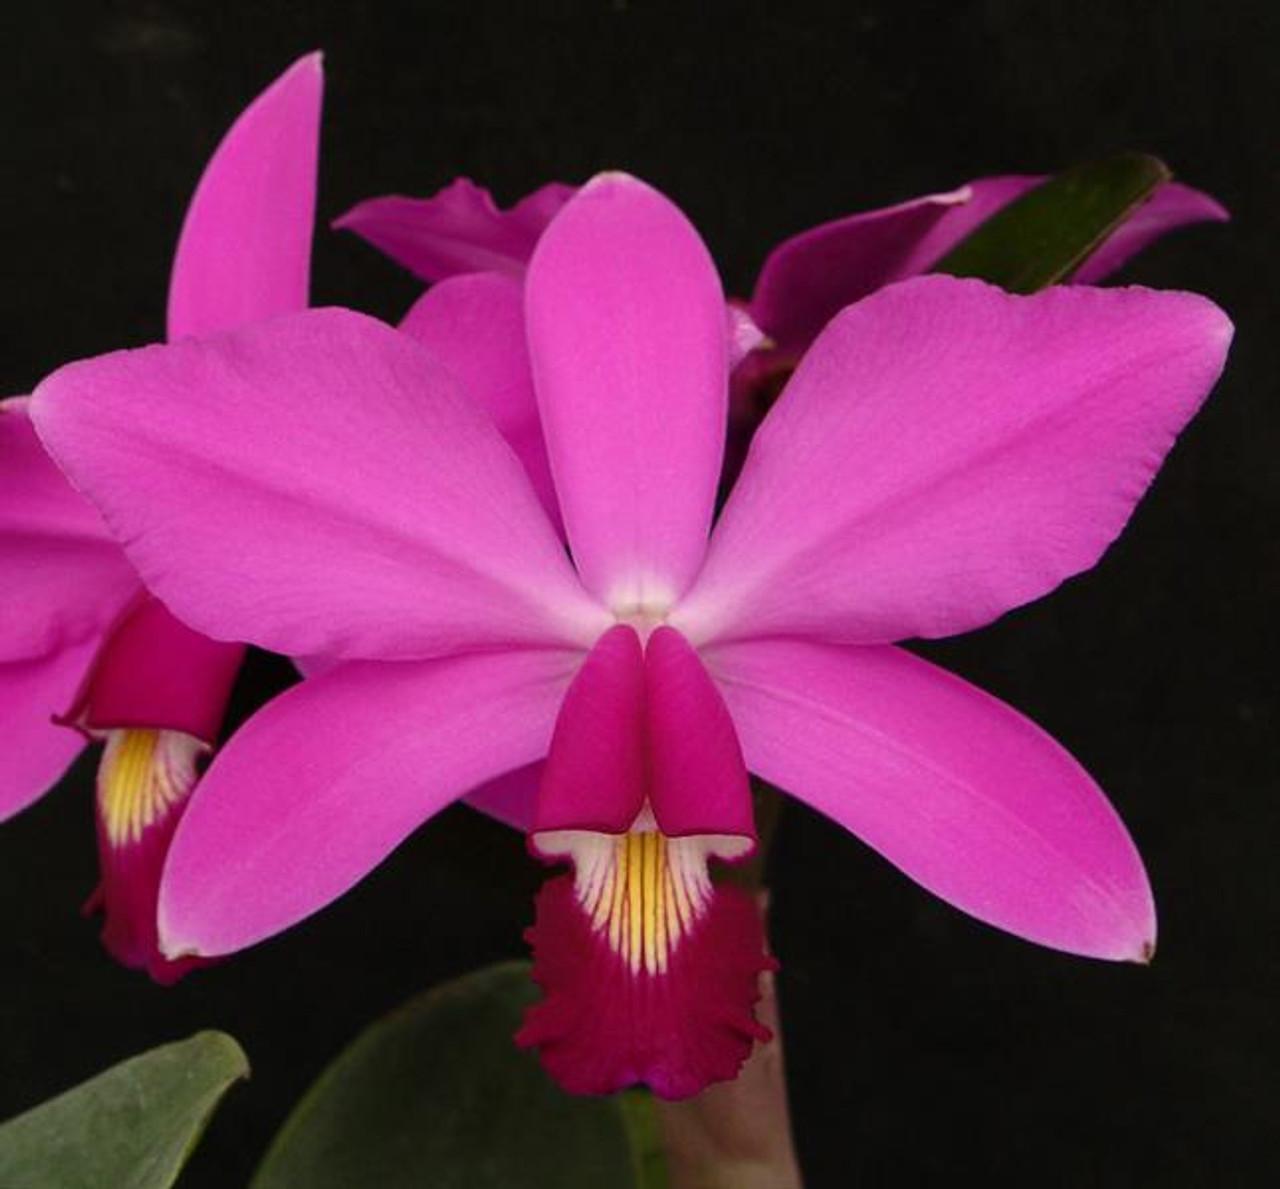 Lc. Celia (L. tenebrosa 'Dark Spell' x violacea 'Muse' FCC/AOS (4N)